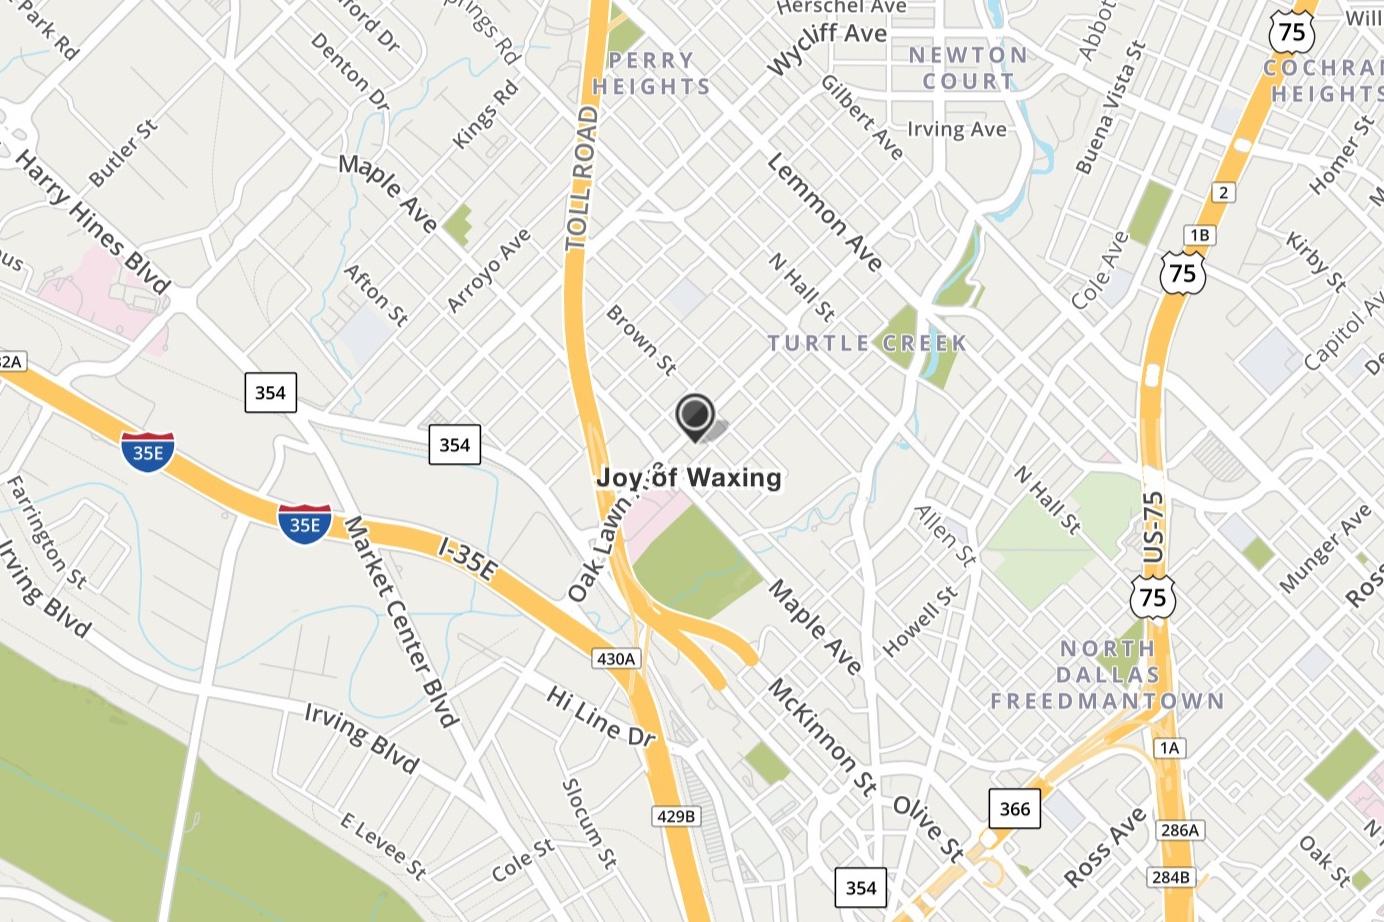 Joy of Waxing - 3622 Fairmount StDallas, TX 75219(972) 968-8772